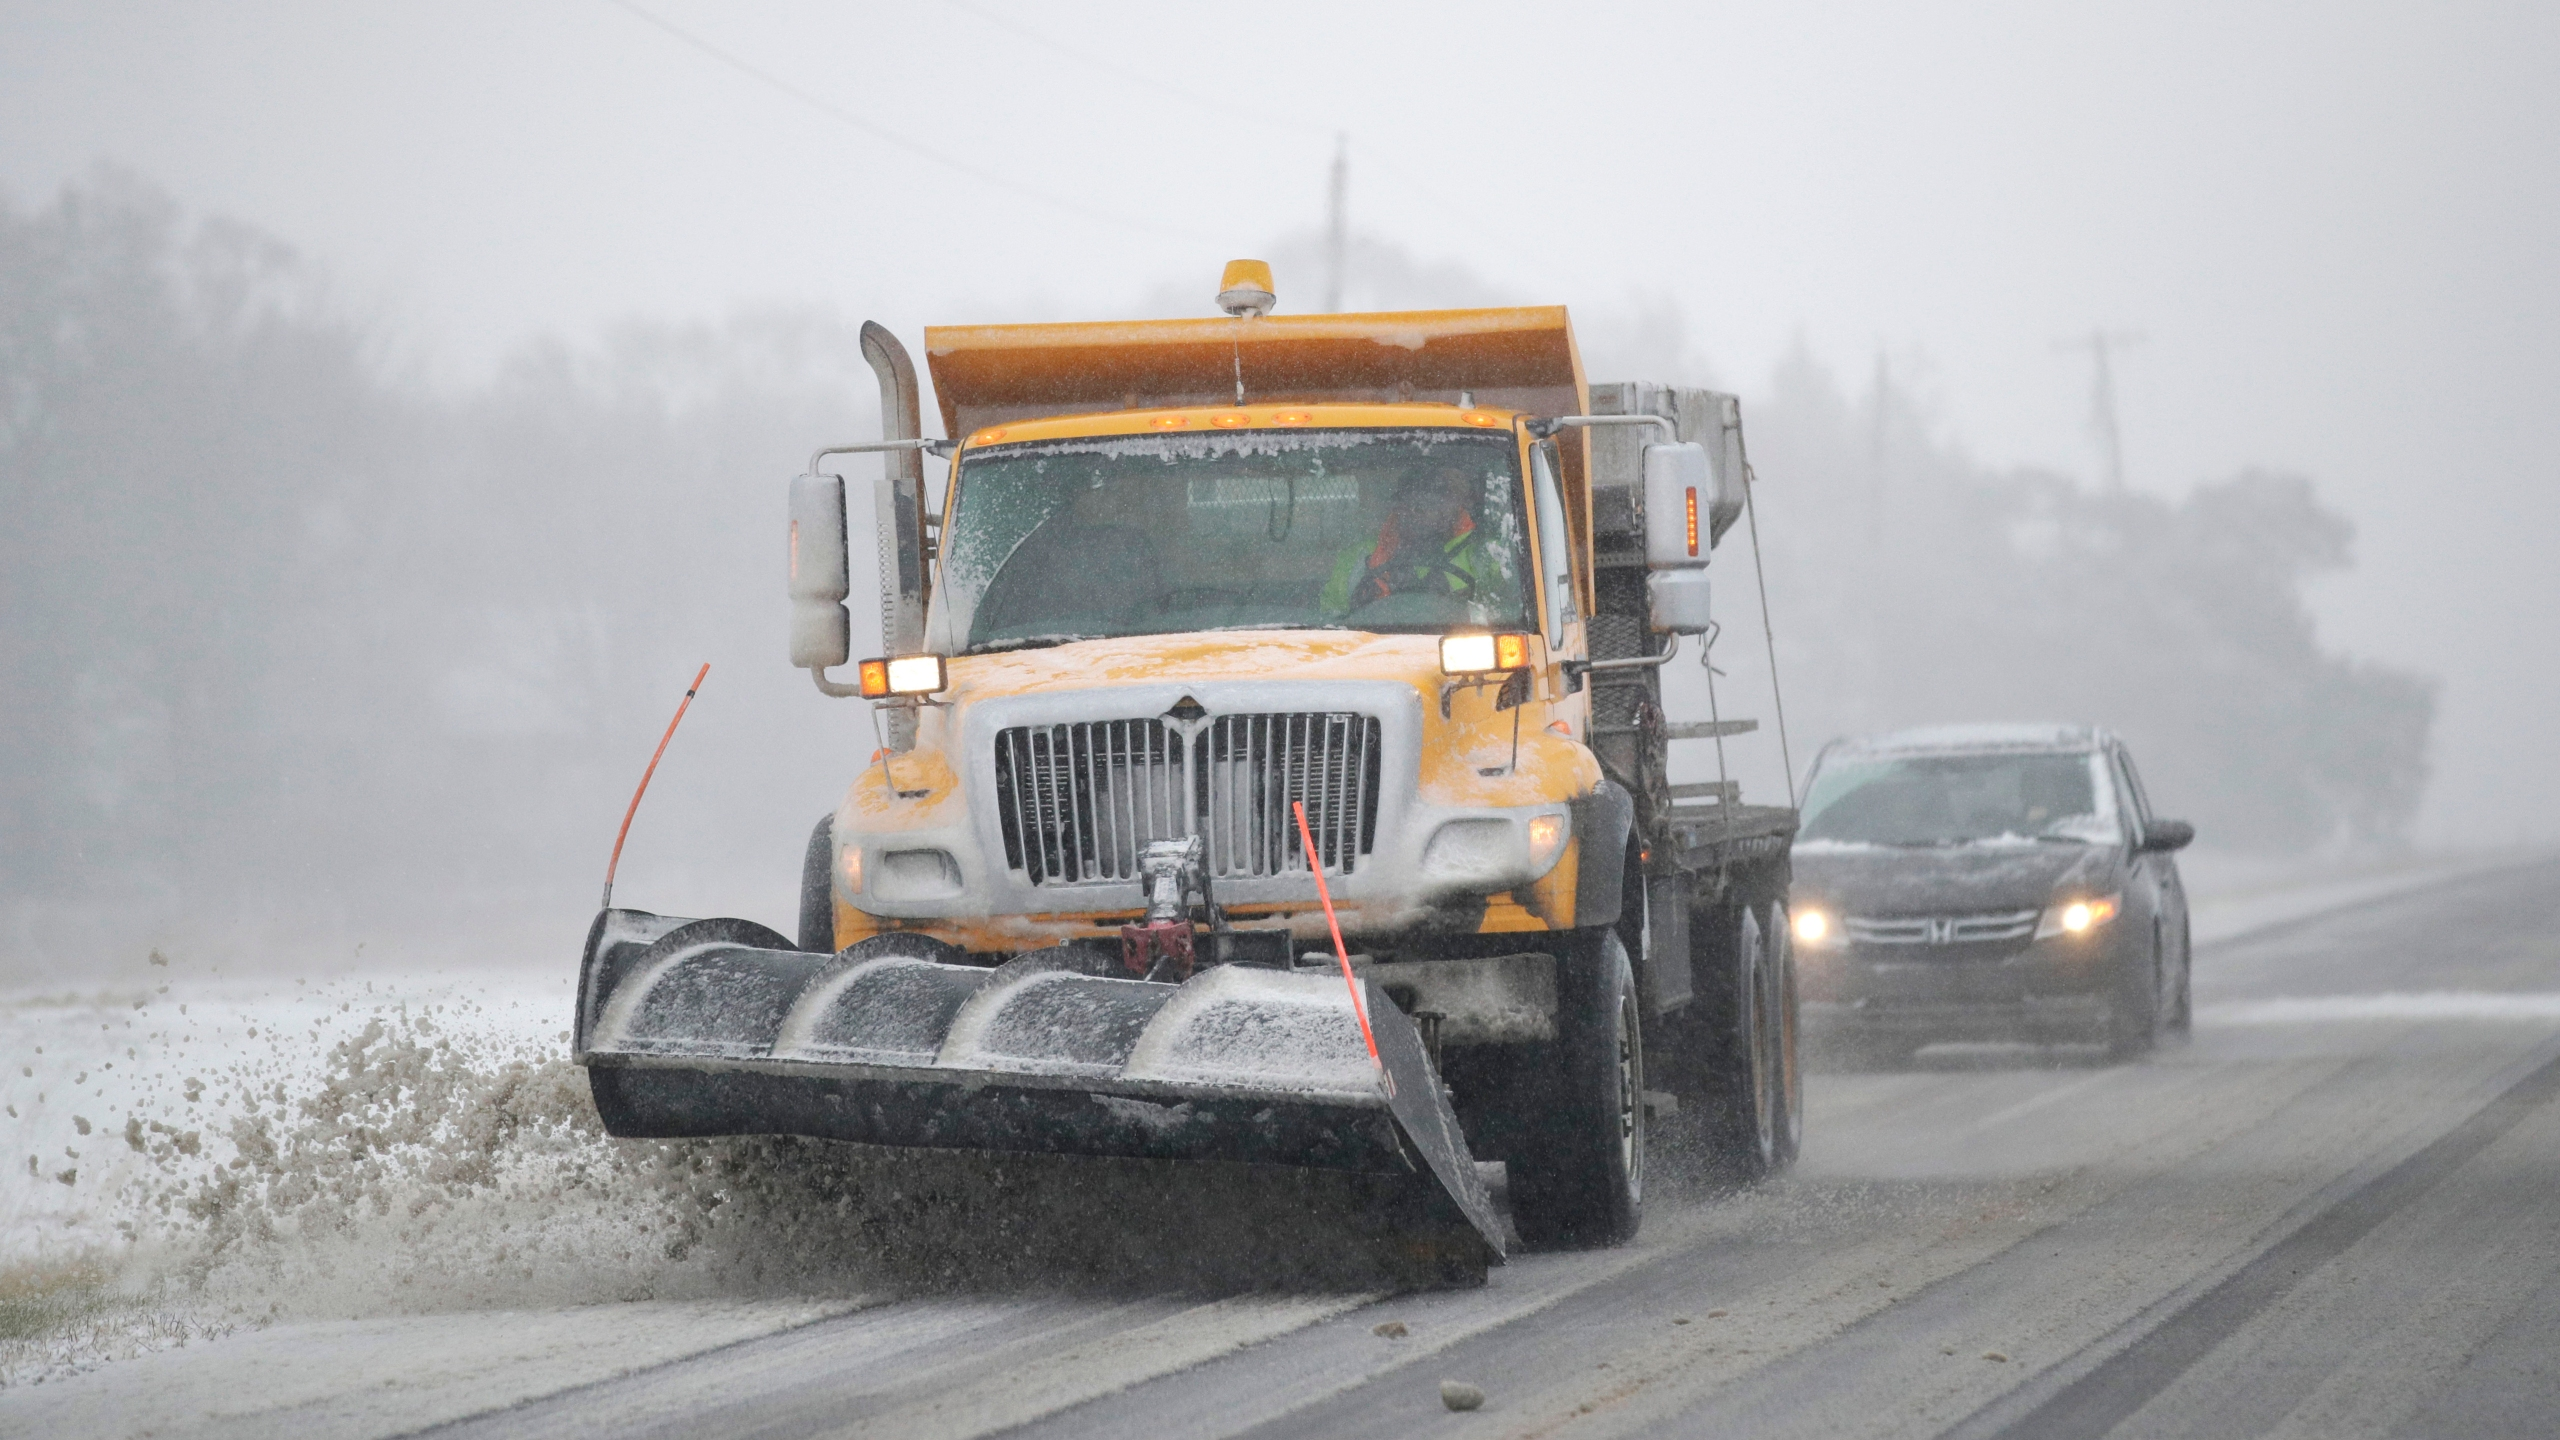 Midwest_Snowstorm_40629-159532.jpg69390798